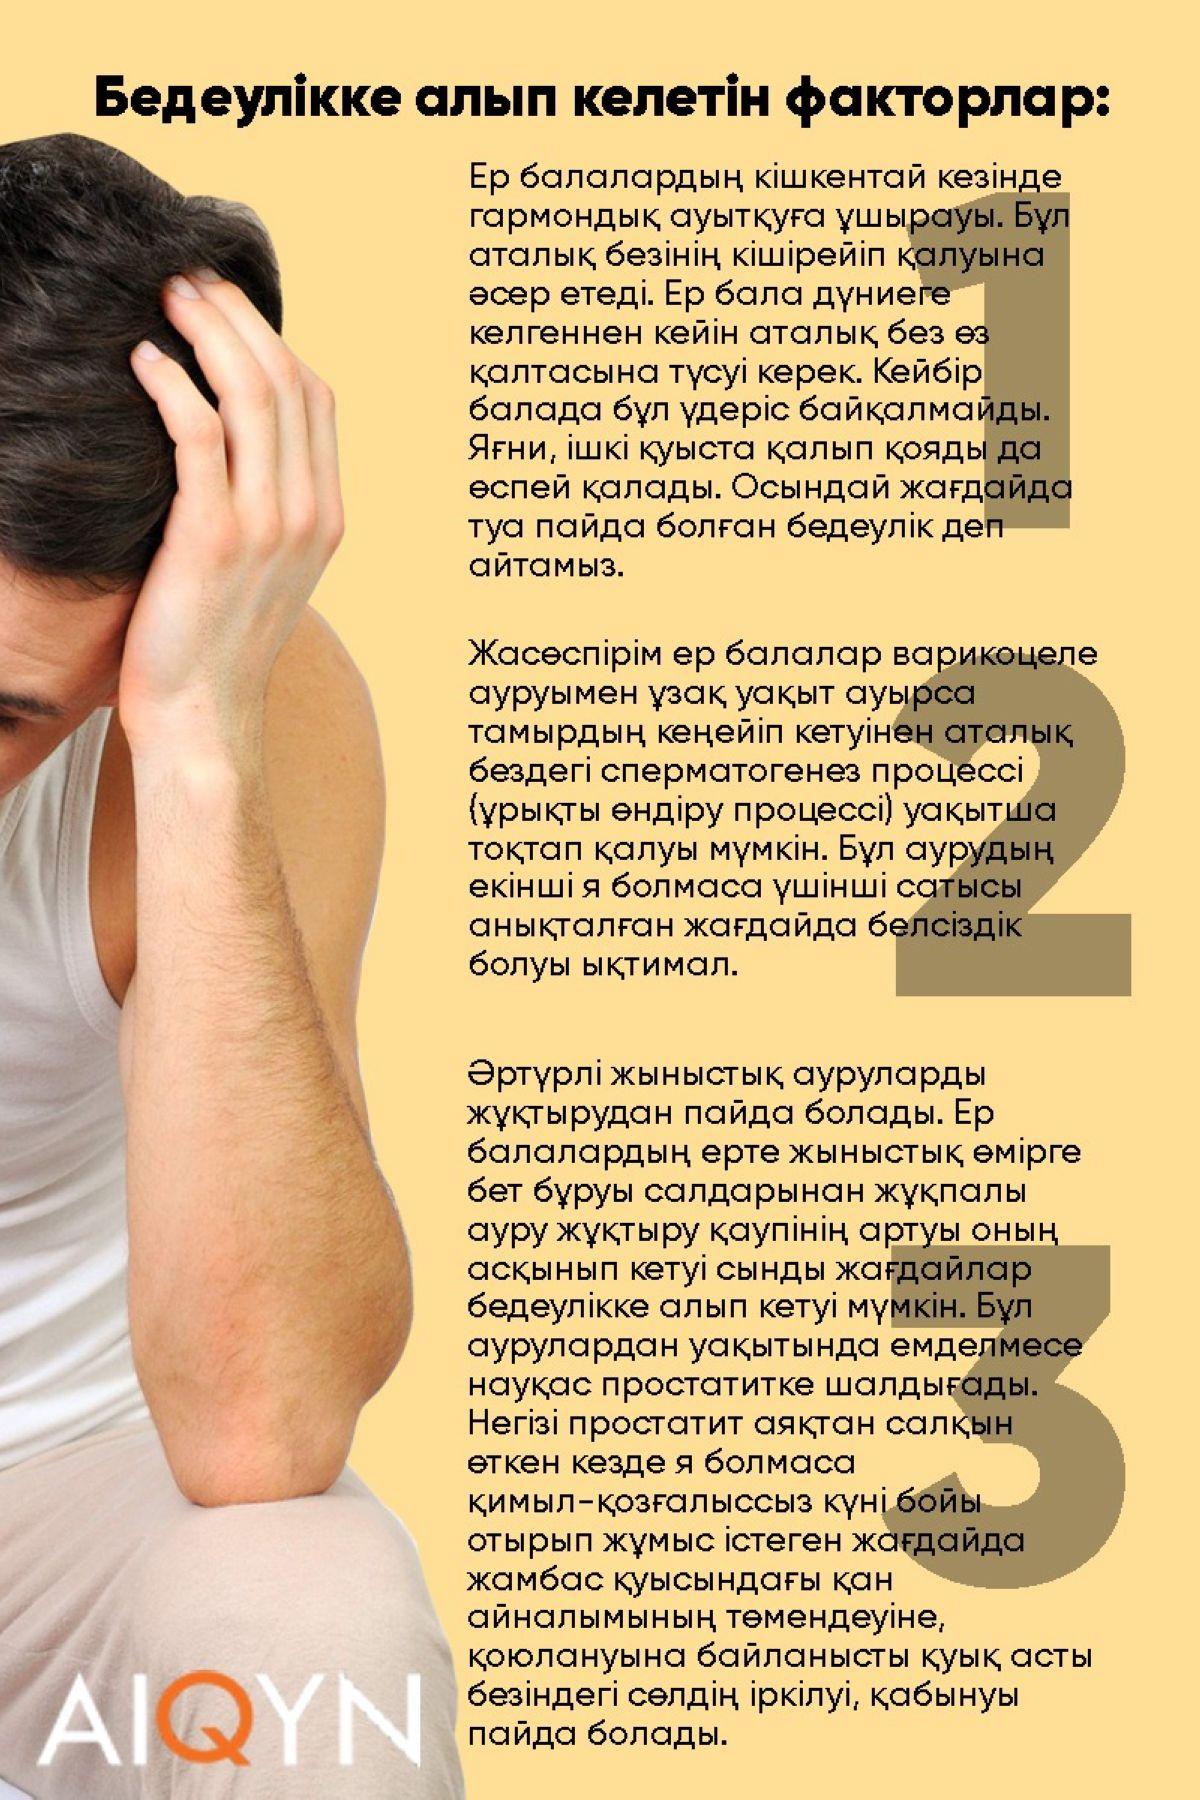 Коронавирус (1)